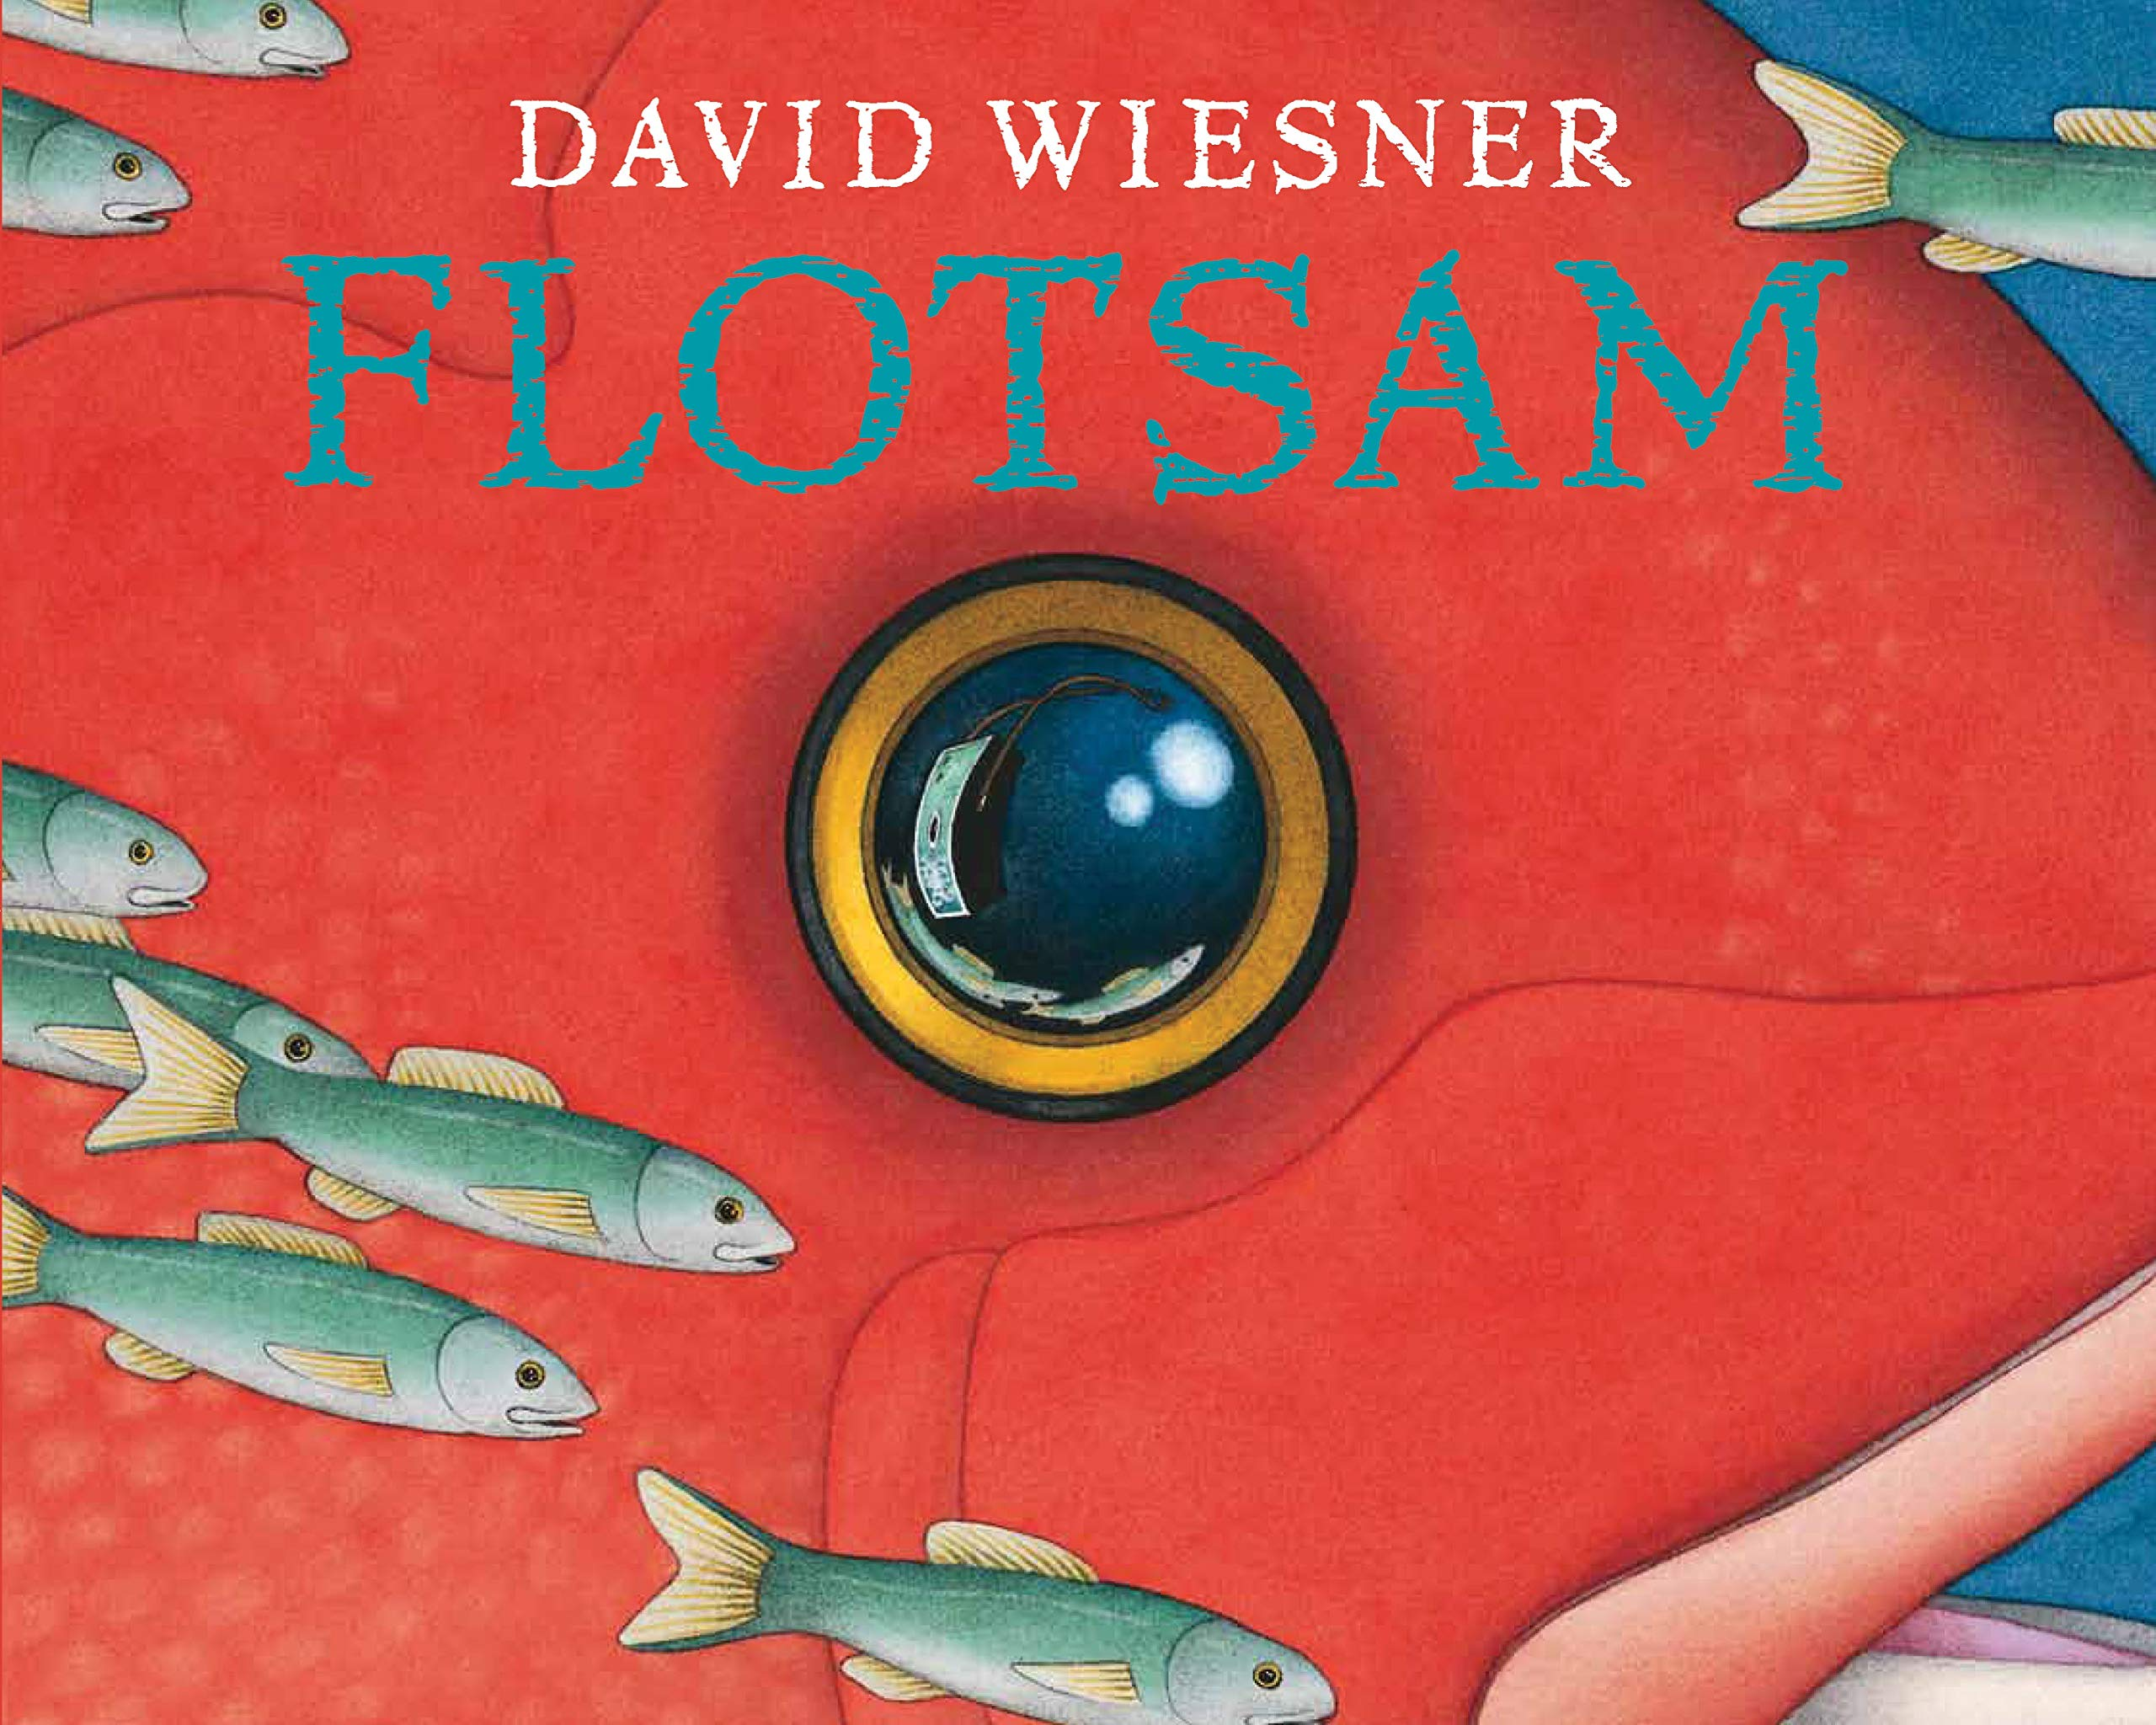 Flotsam: Amazon.co.uk: Wiesner, David: Books